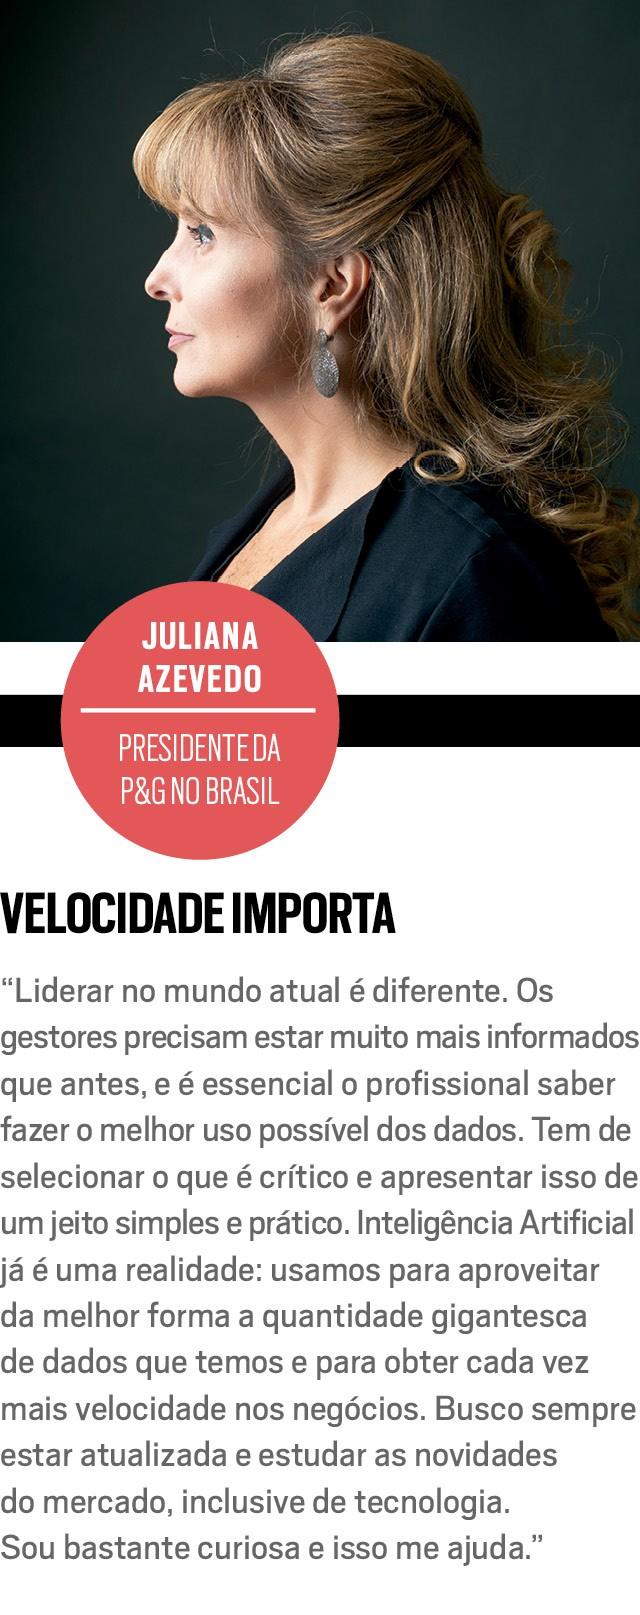 JULIANA AZEVEDO, presidente da P&G no Brasil (Foto: Marcus Steinmeyer)